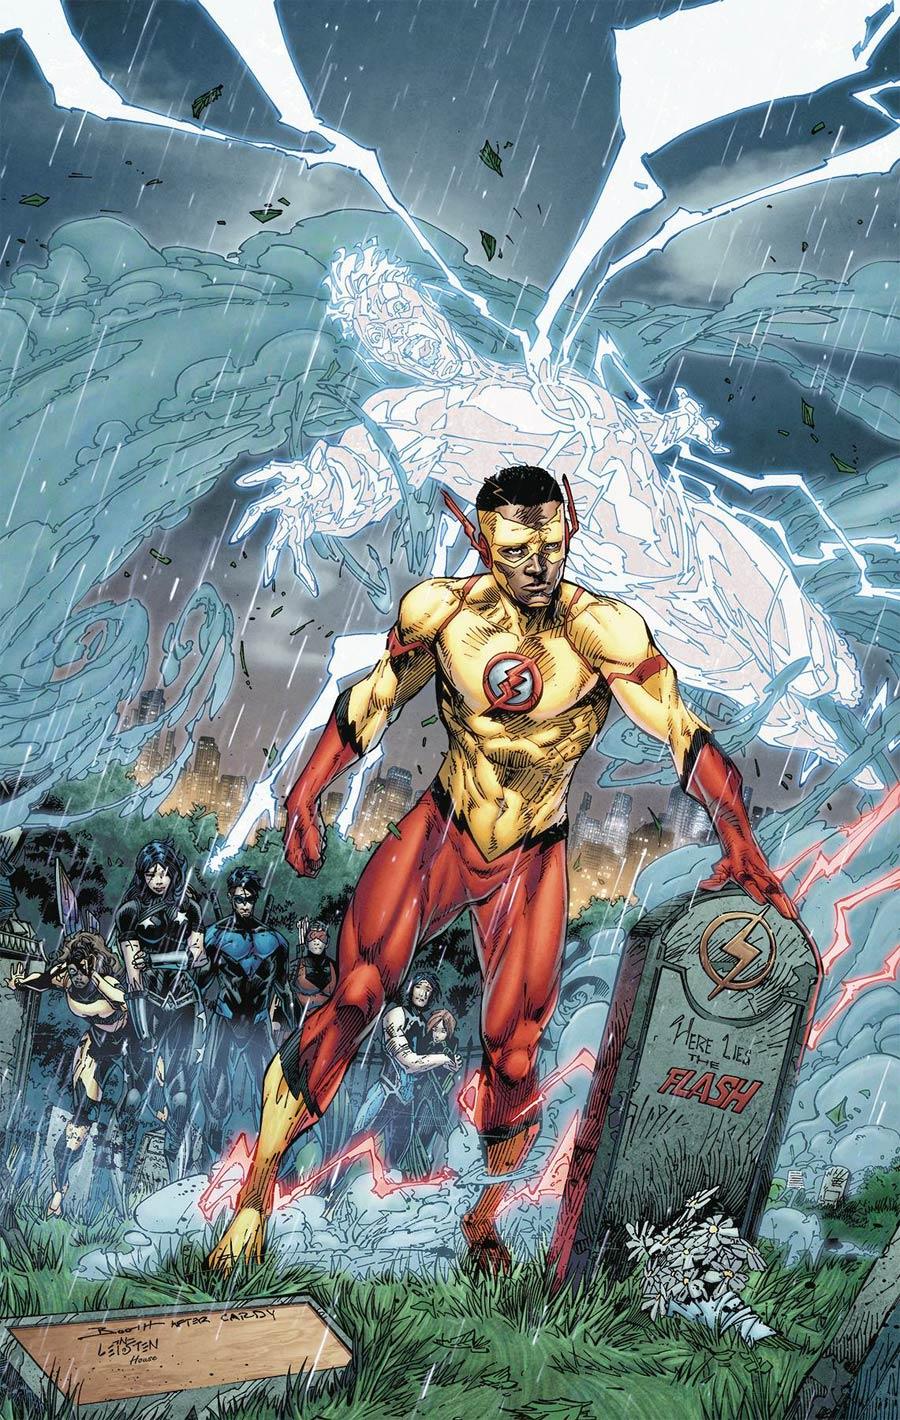 Titans Vol 3 #16 Cover A Regular Brett Booth & Norm Rapmund Cover